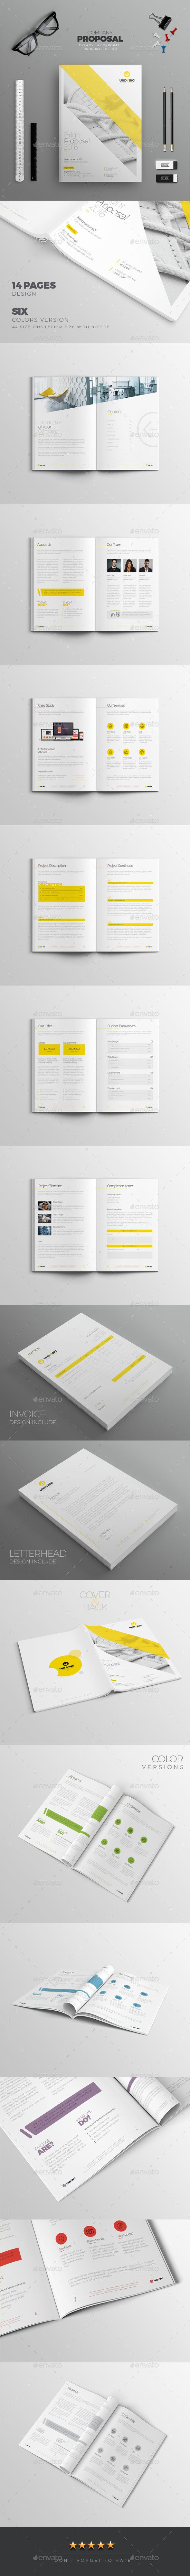 416 best Workbook Design images on Pinterest | Brochure template ...